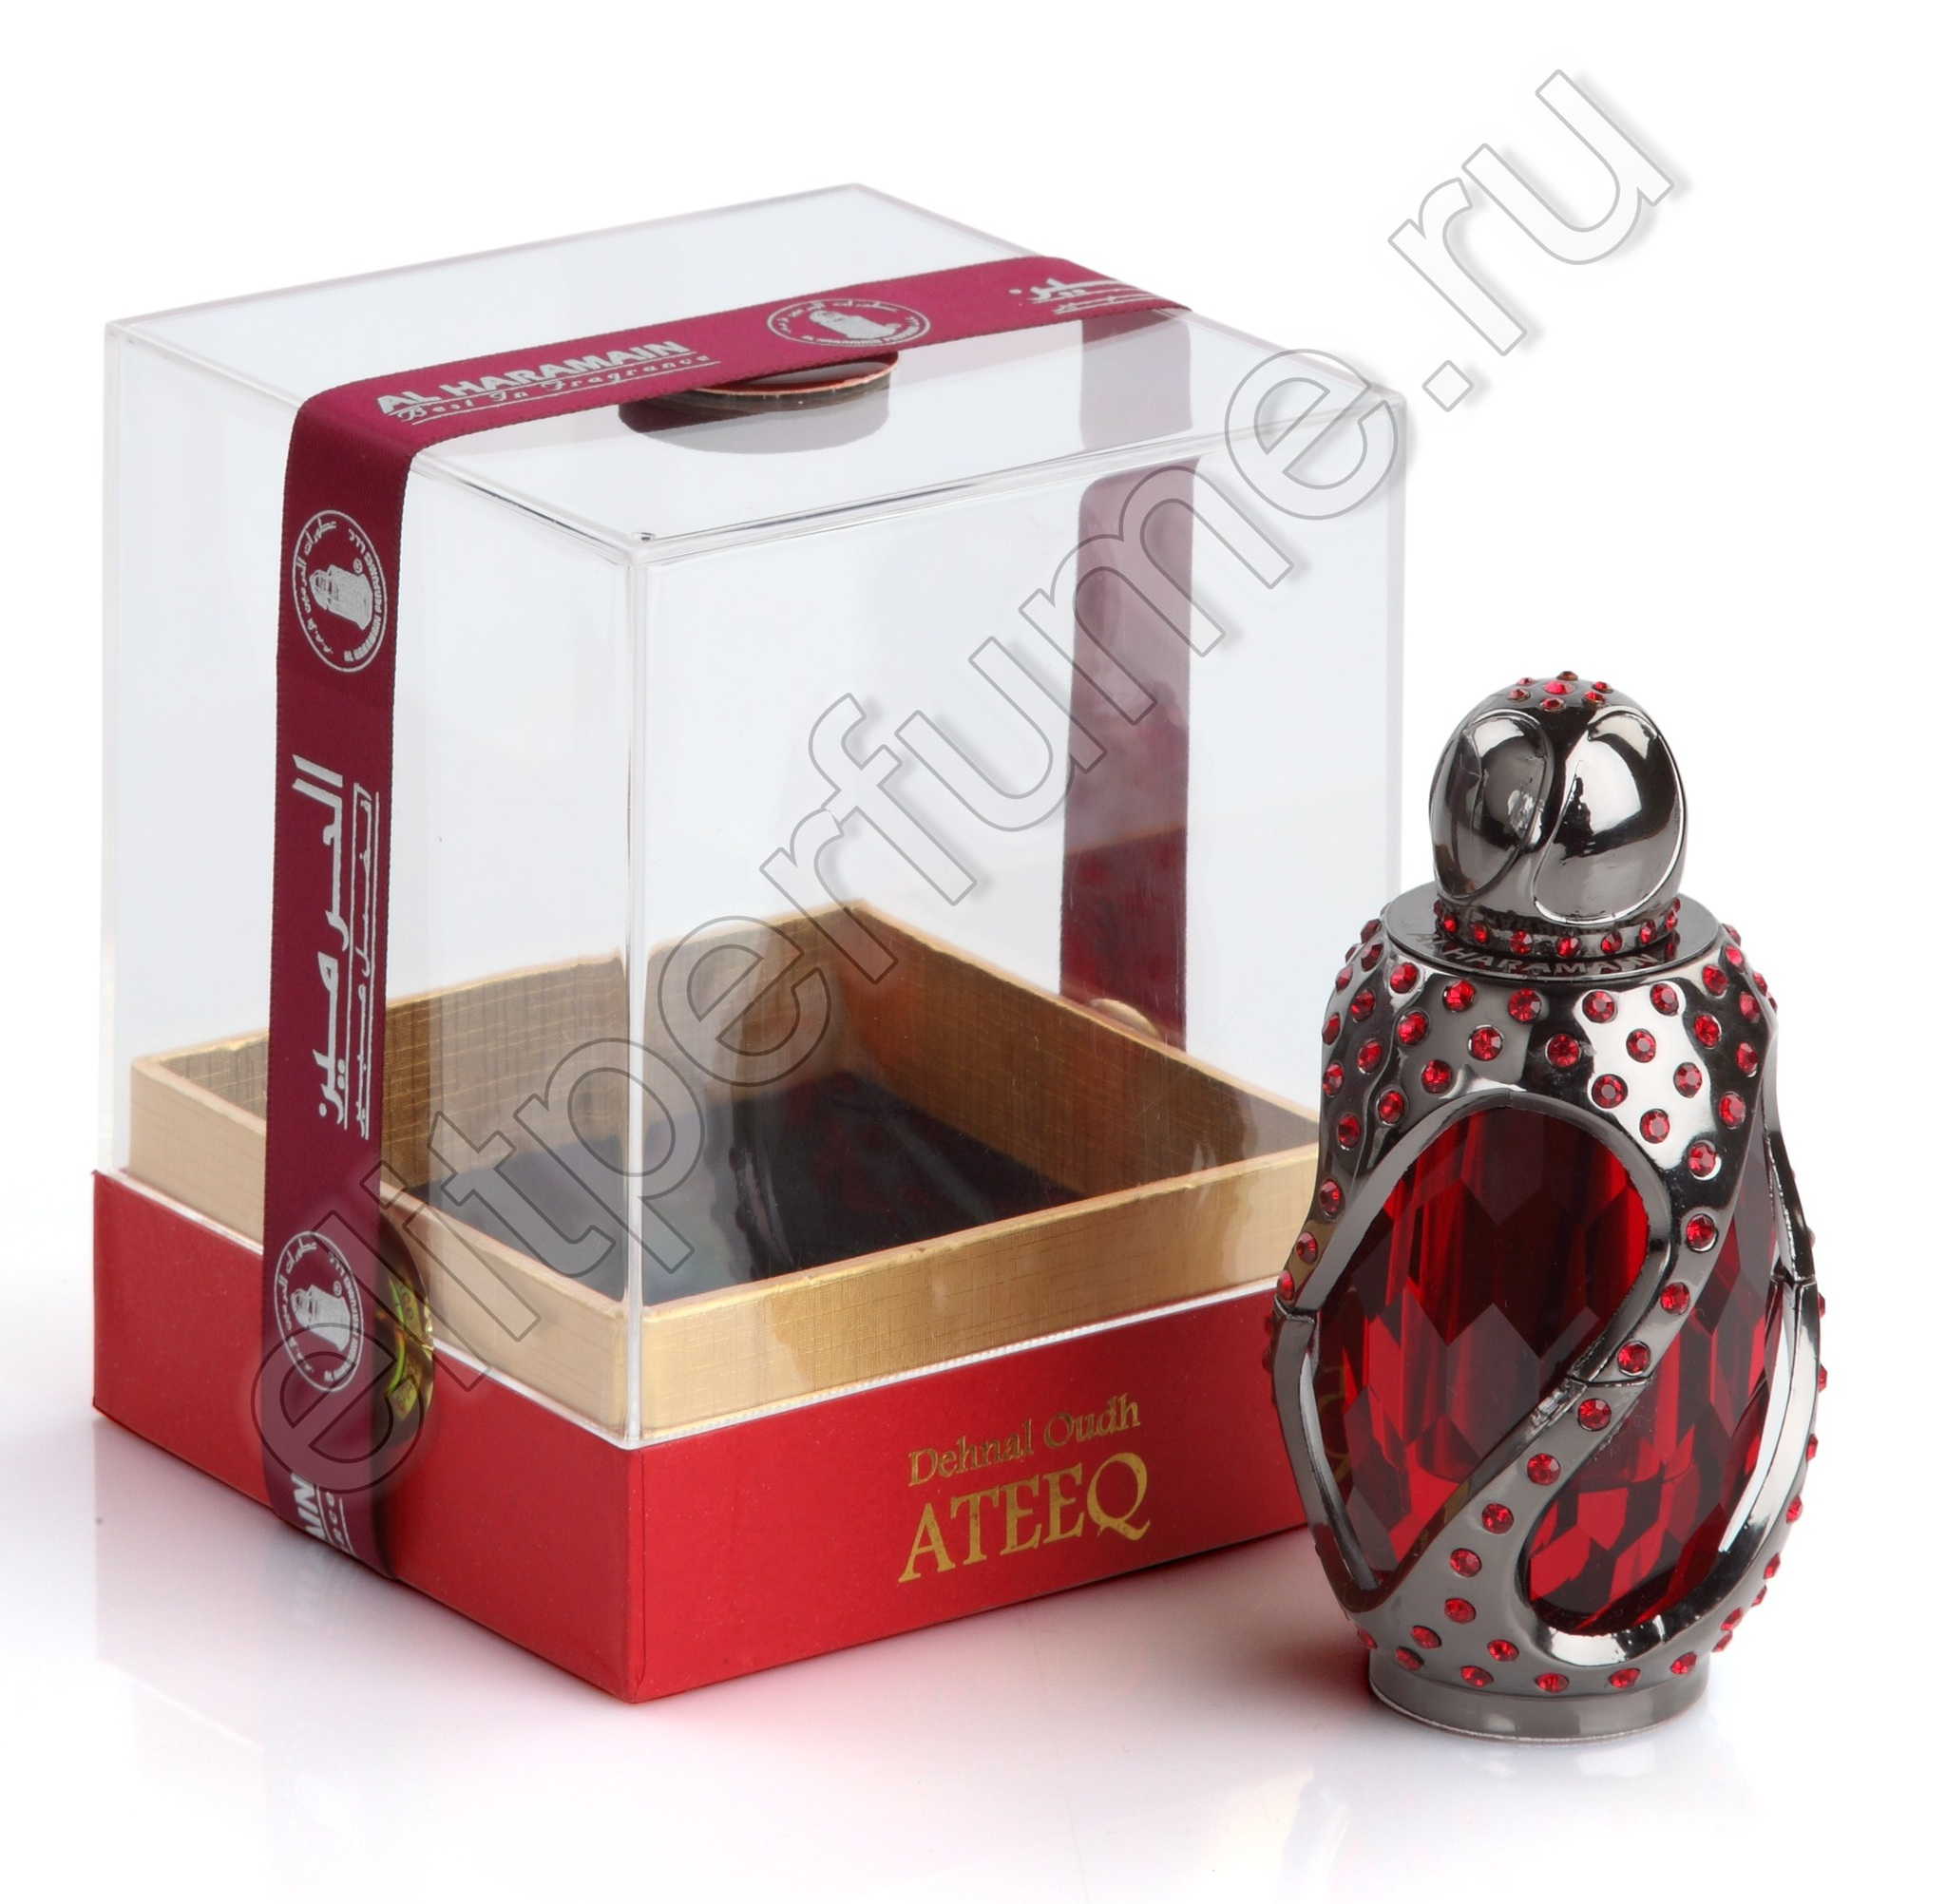 Ден аль Уд Атик Dehn al Oudh Ateeq 6 мл арабские масляные духи от Аль Харамайн Al Haramain Perfumes